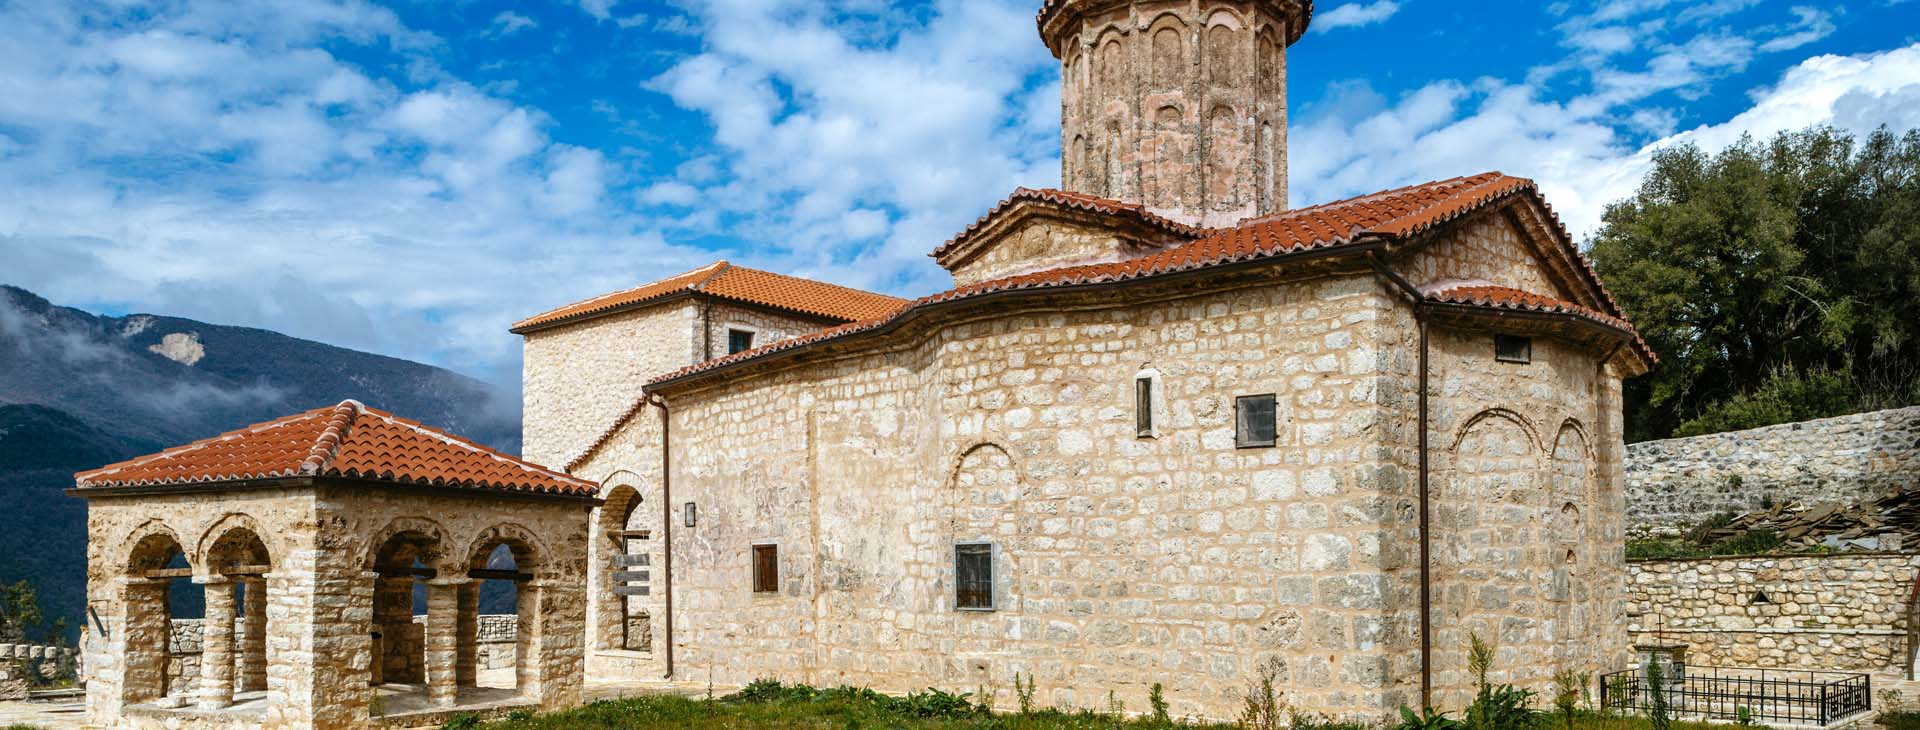 Monastery of Sosino, Ioannina